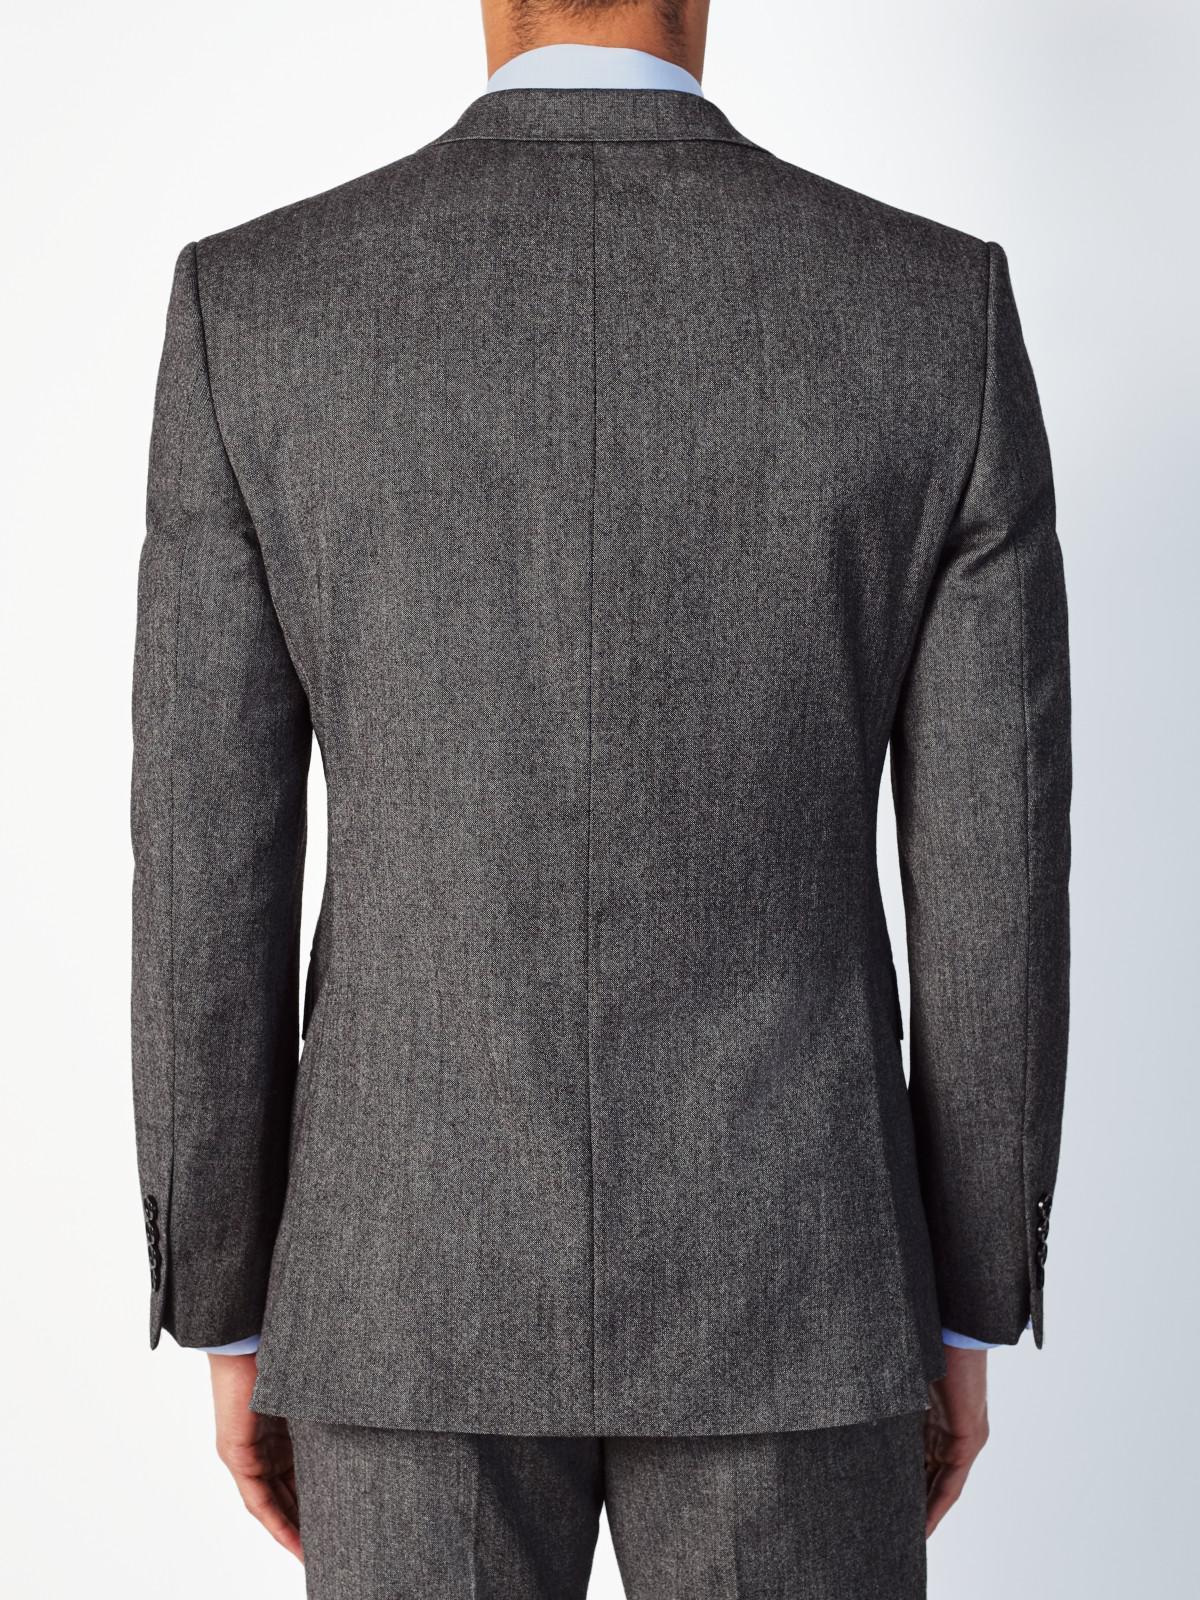 John Lewis Wool Donegal Regular Fit Suit Jacket in Light Grey (Grey) for Men